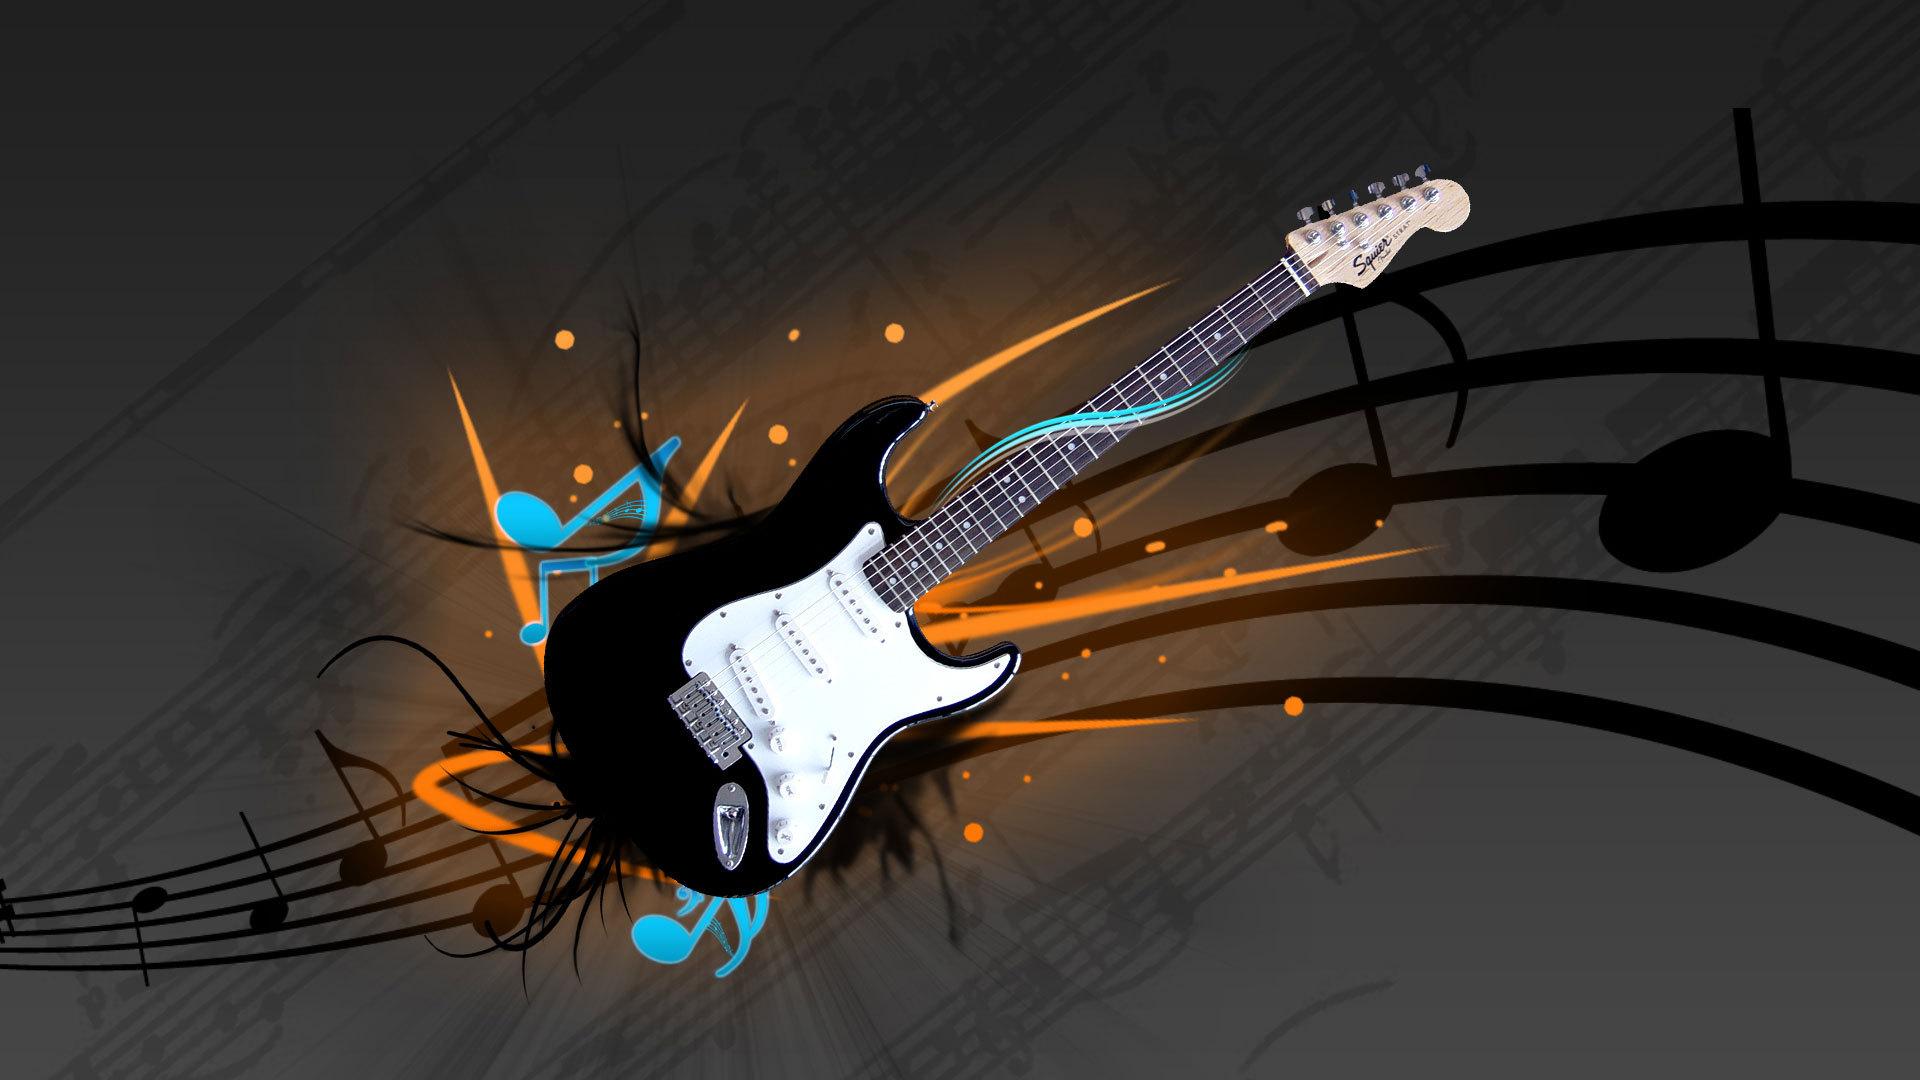 guitar electric guitar stratocaster fender squier music wallpaper 1920x1080